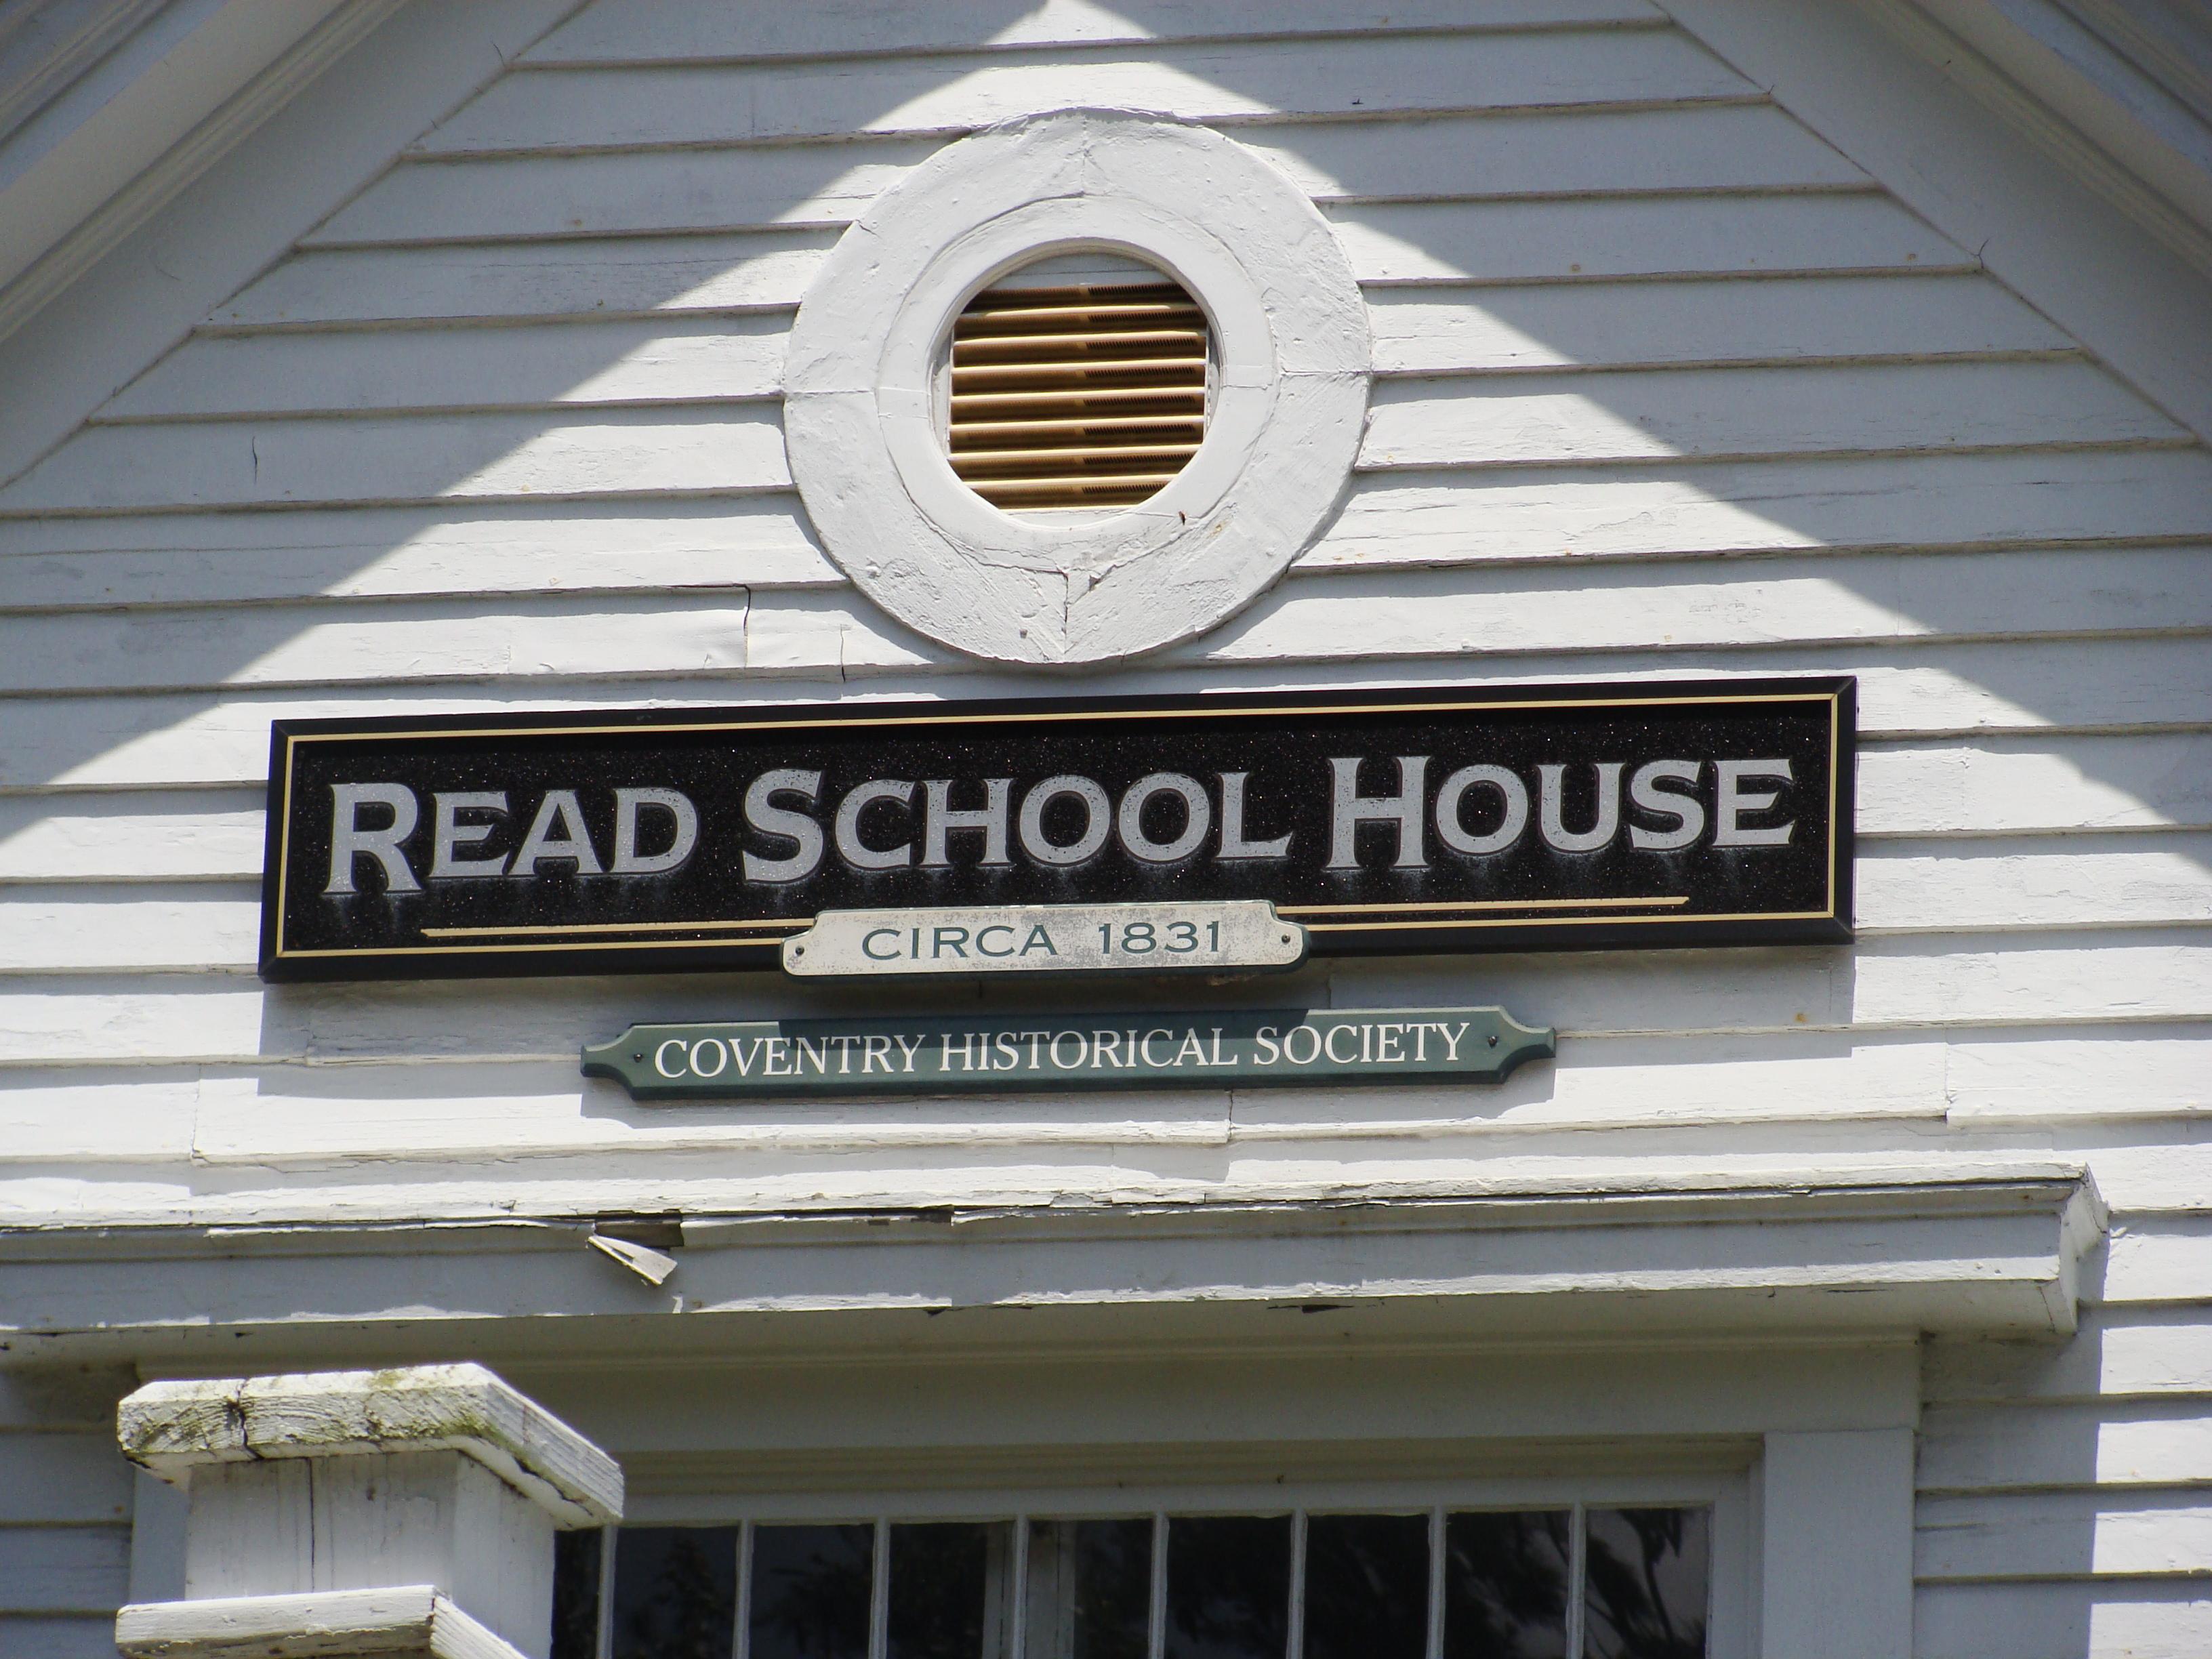 File:Closeup of Read School sign.JPG - Wikimedia Commons